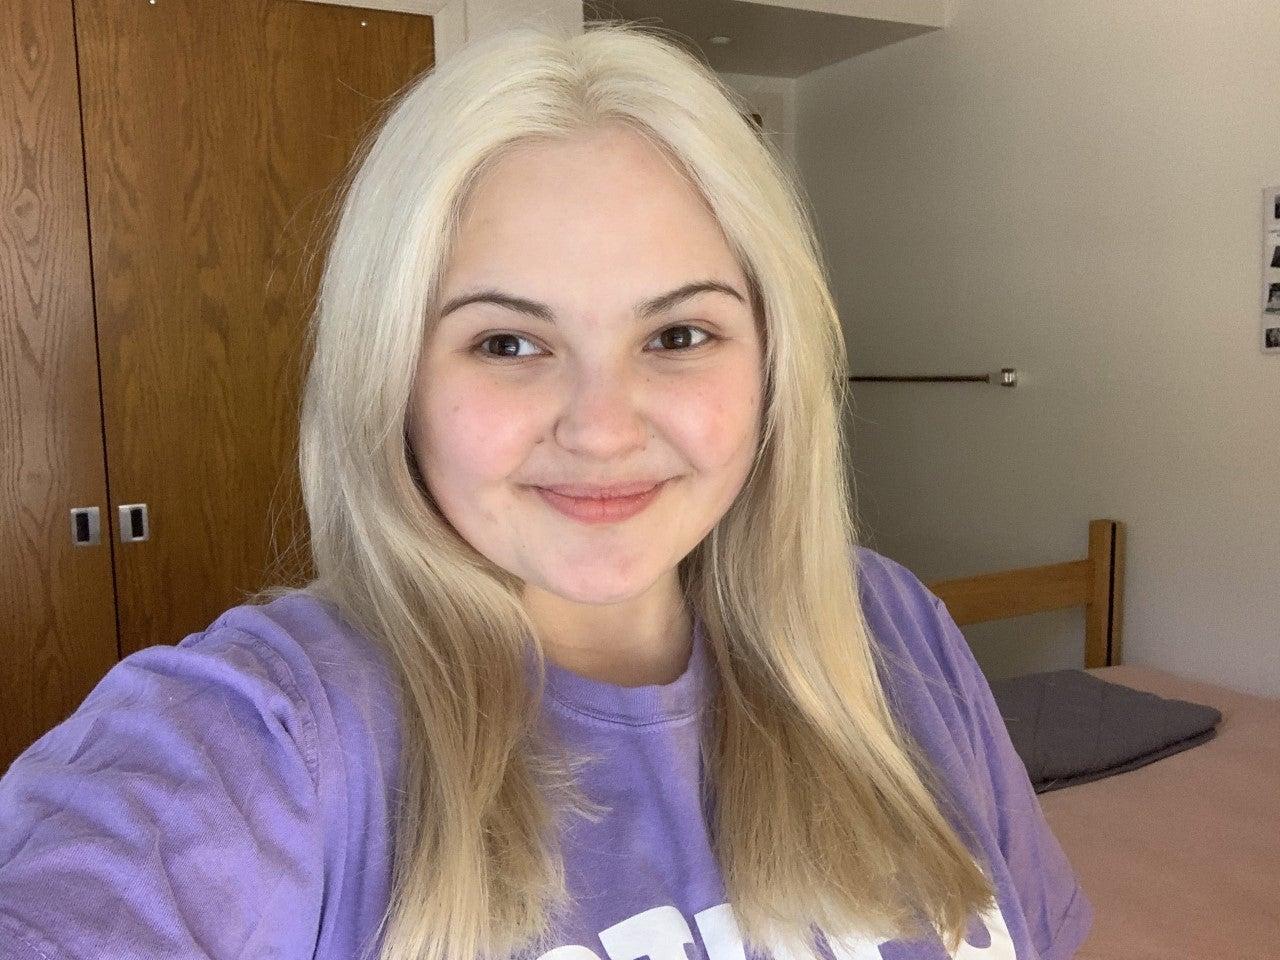 girl with no makeup